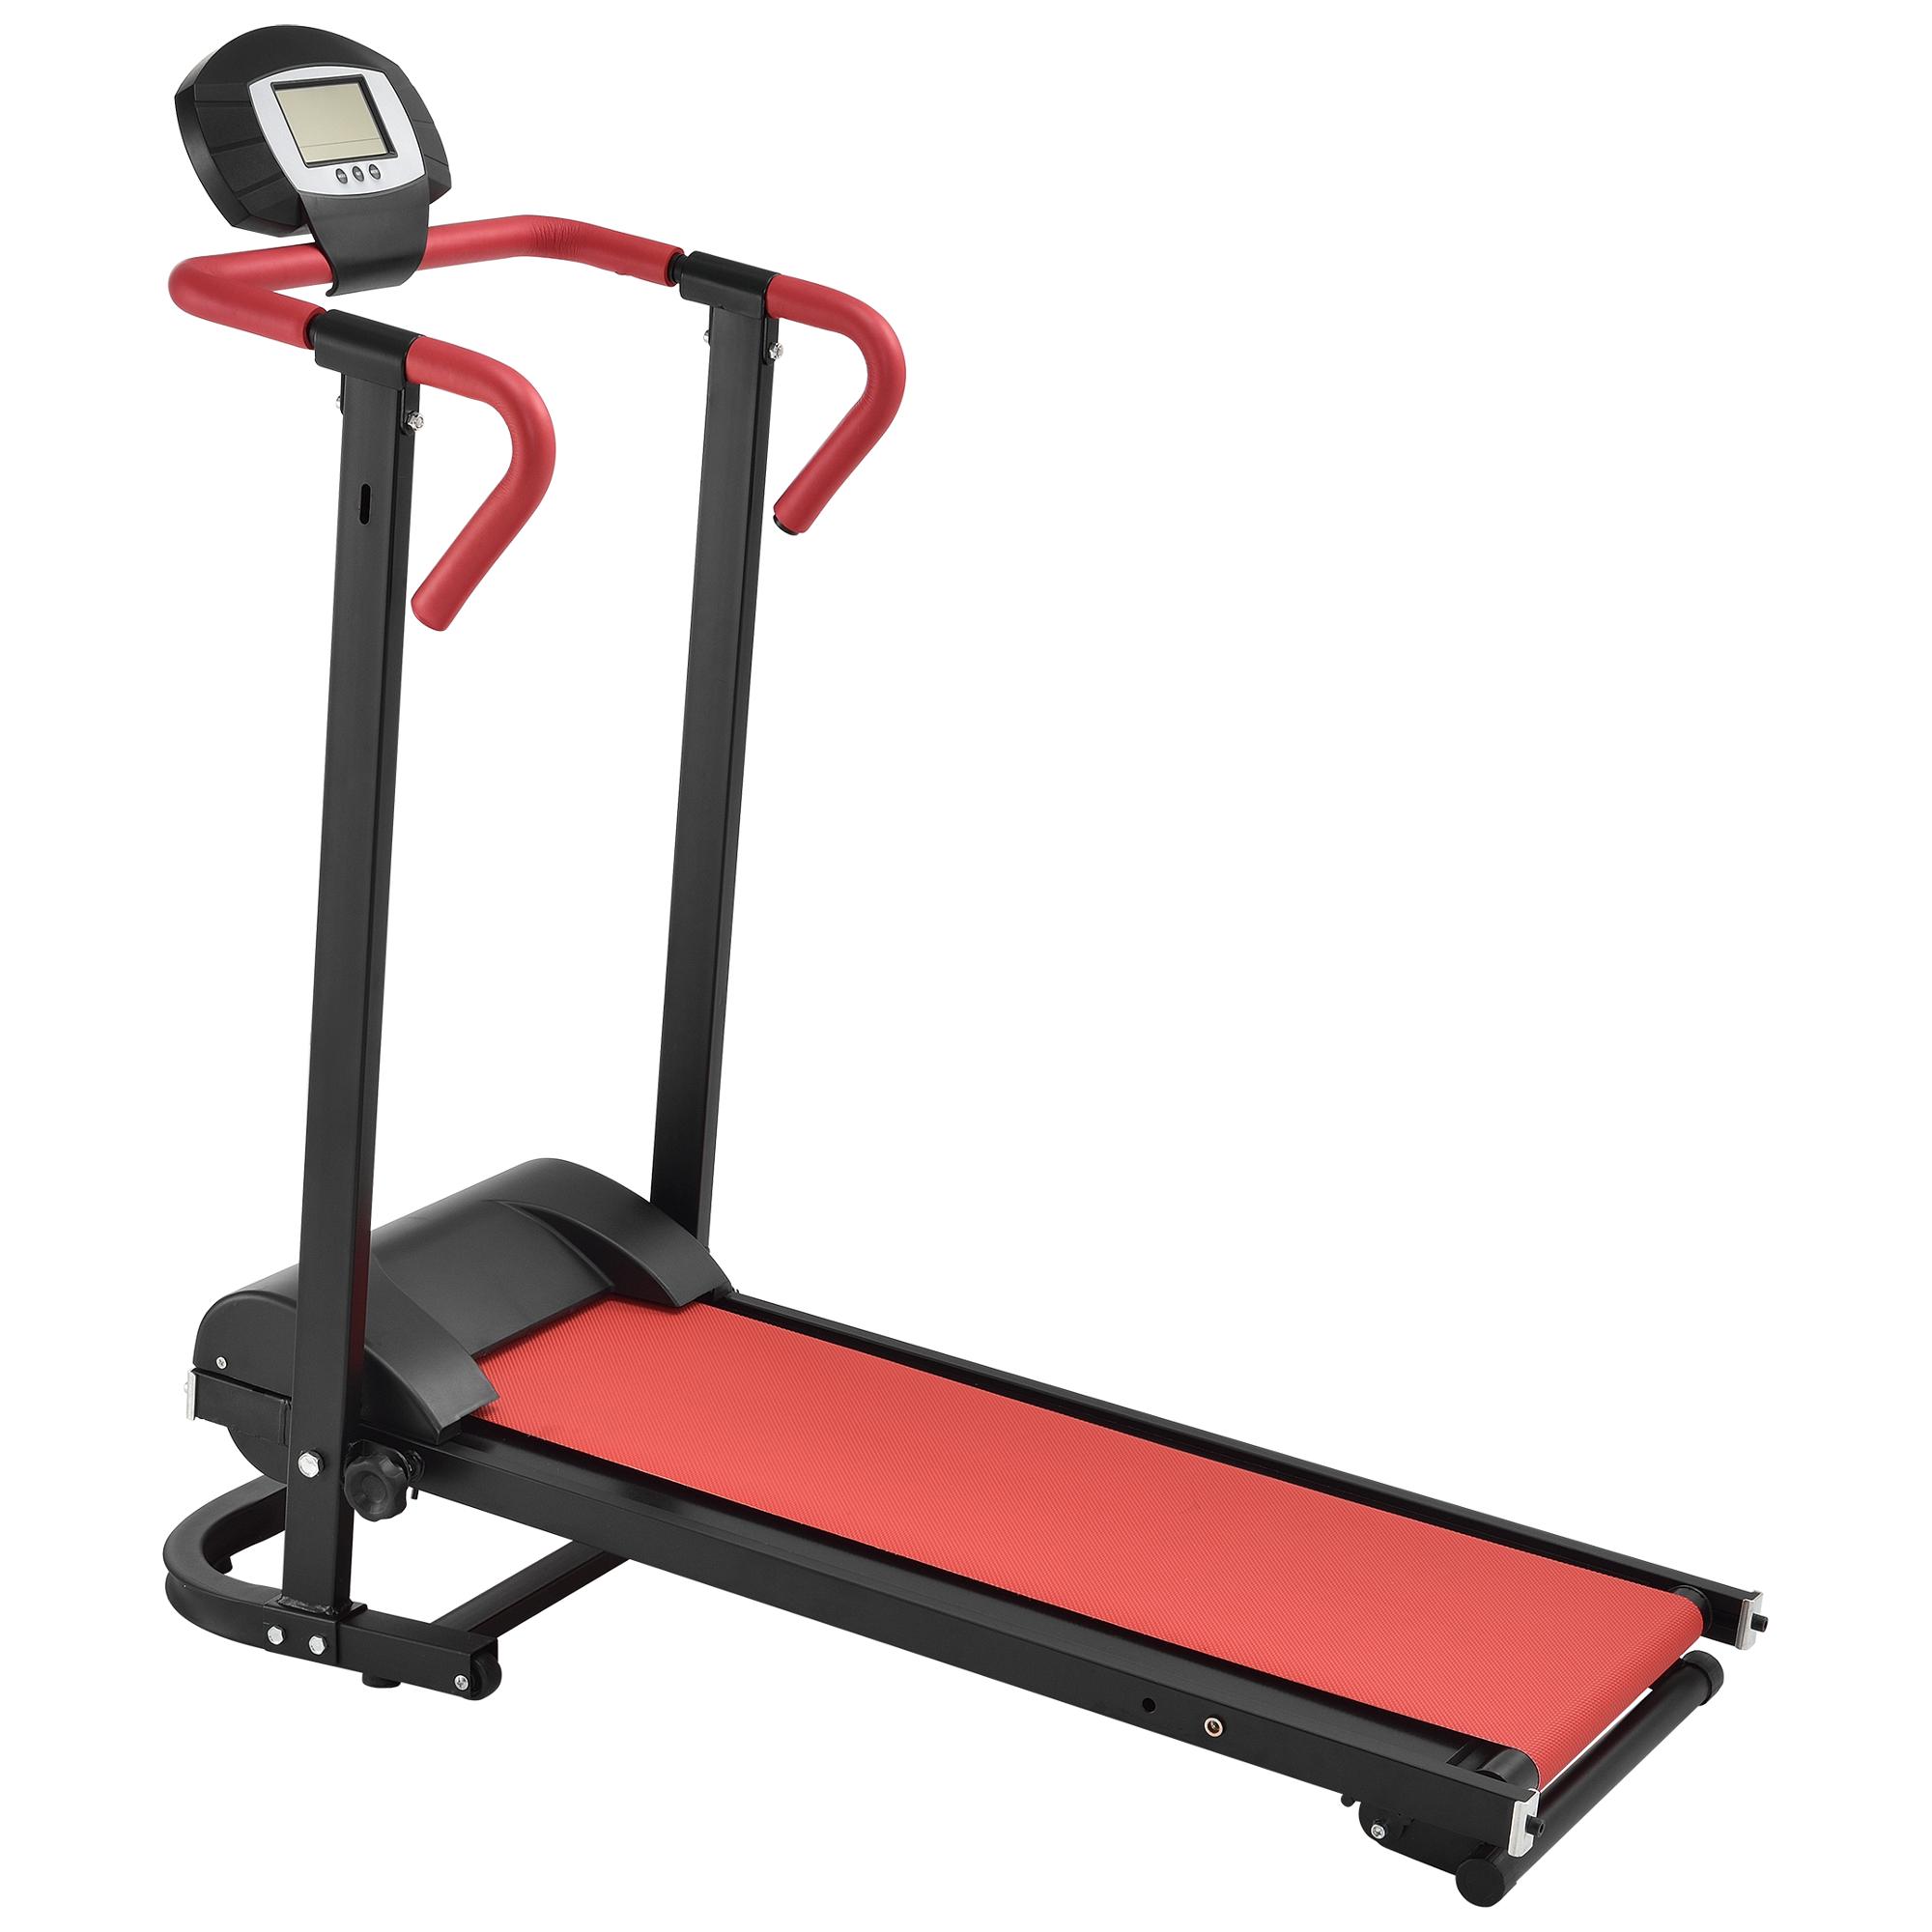 In-Tec-manualmente-tapis-roulant-con-LCD-Display-Fitness-Cyclette-pieghevole